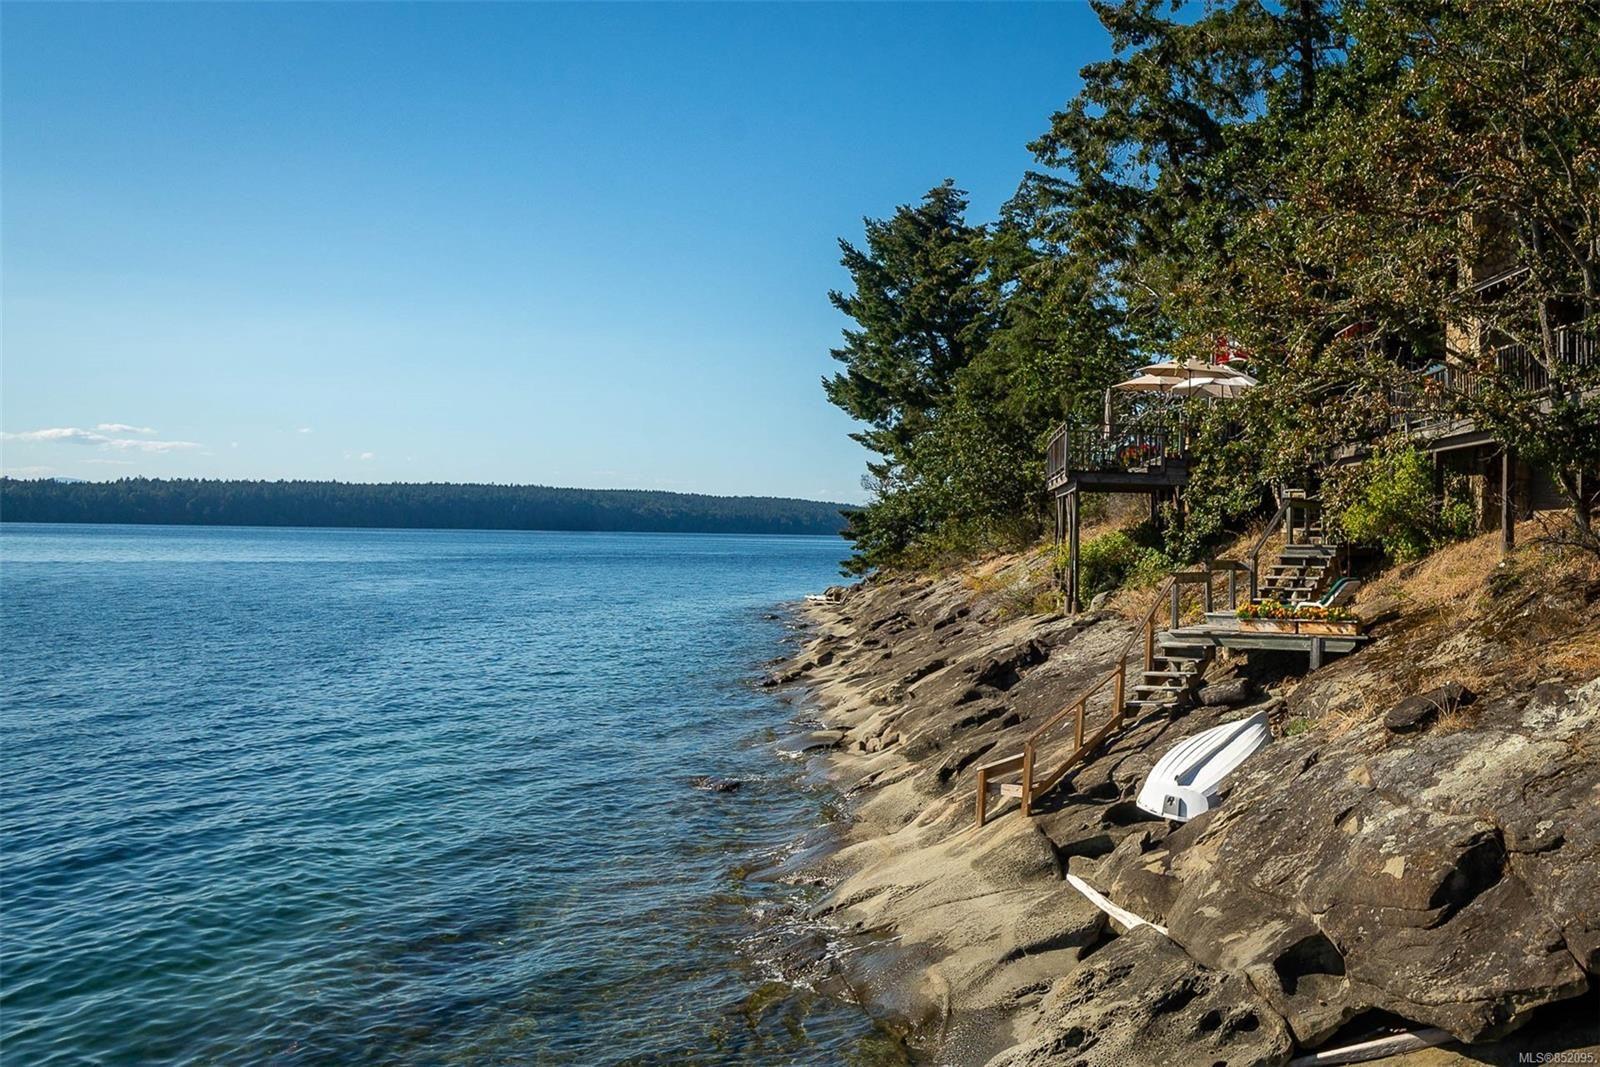 Photo 6: Photos: 236 McGill Rd in : GI Salt Spring House for sale (Gulf Islands)  : MLS®# 852095